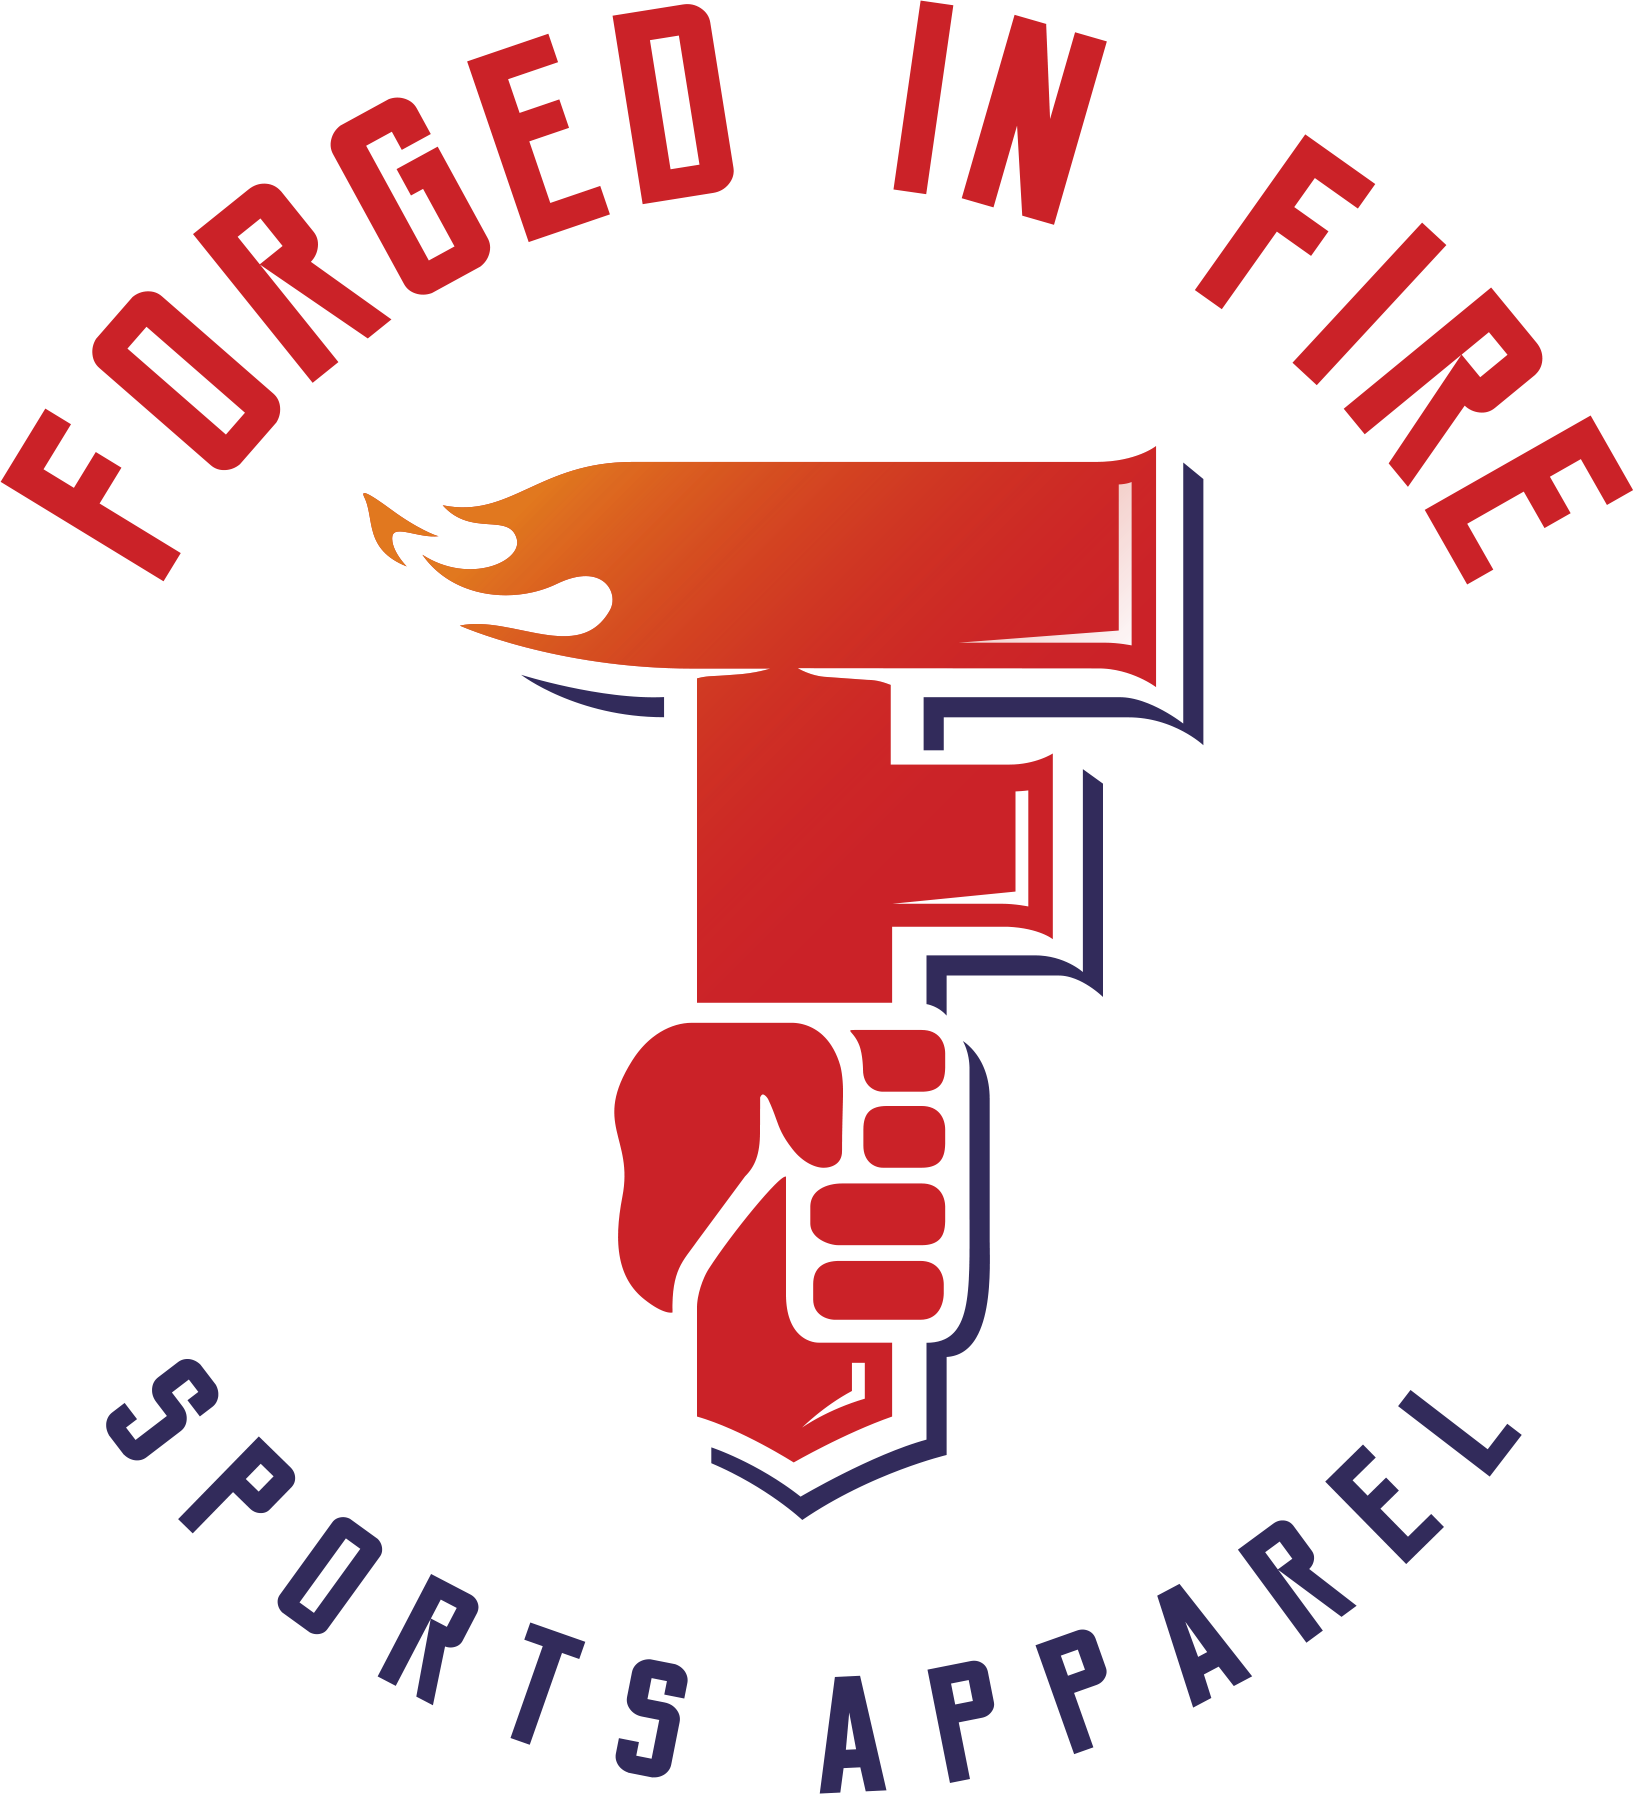 Logo for a sports/athletics/bjj apparel company